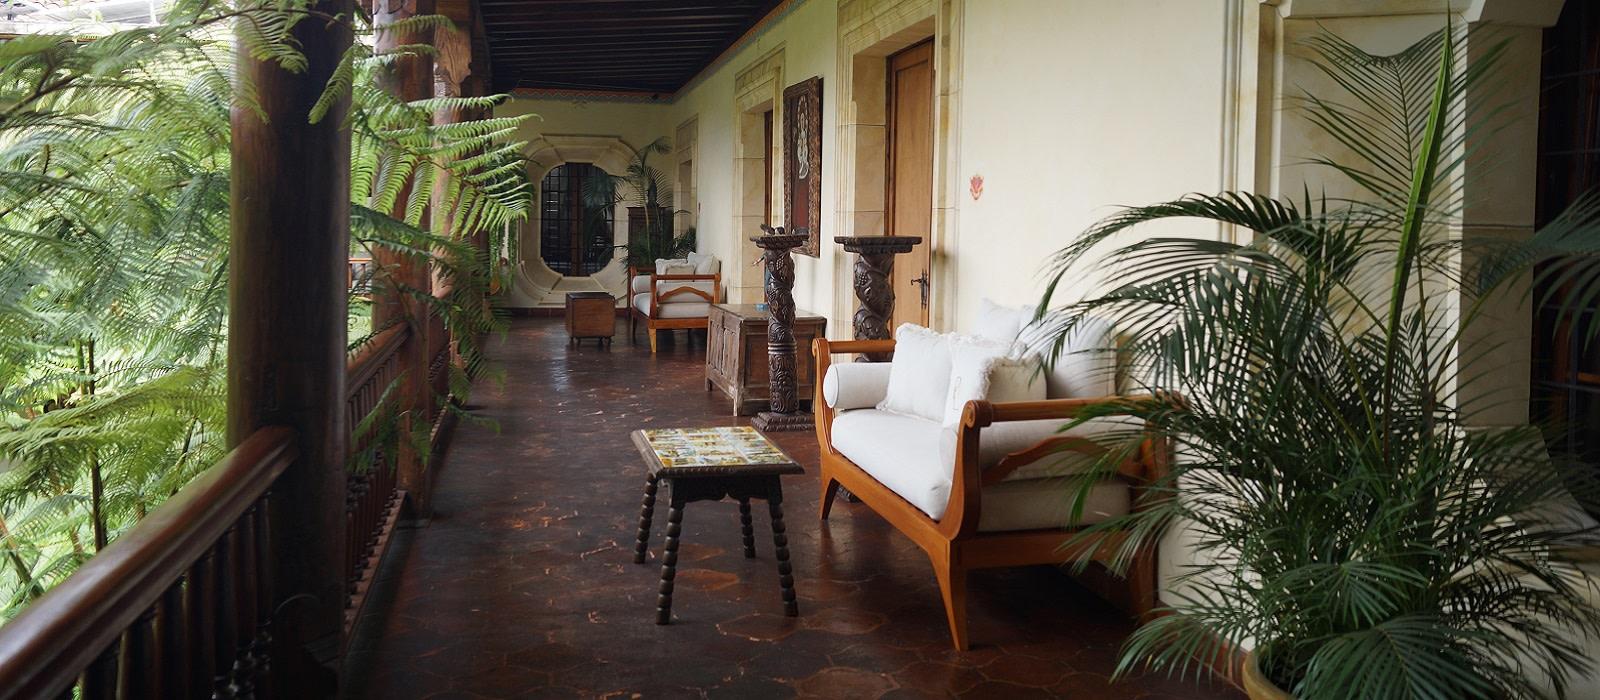 Hotel Palacio Doña Leonor Guatemala